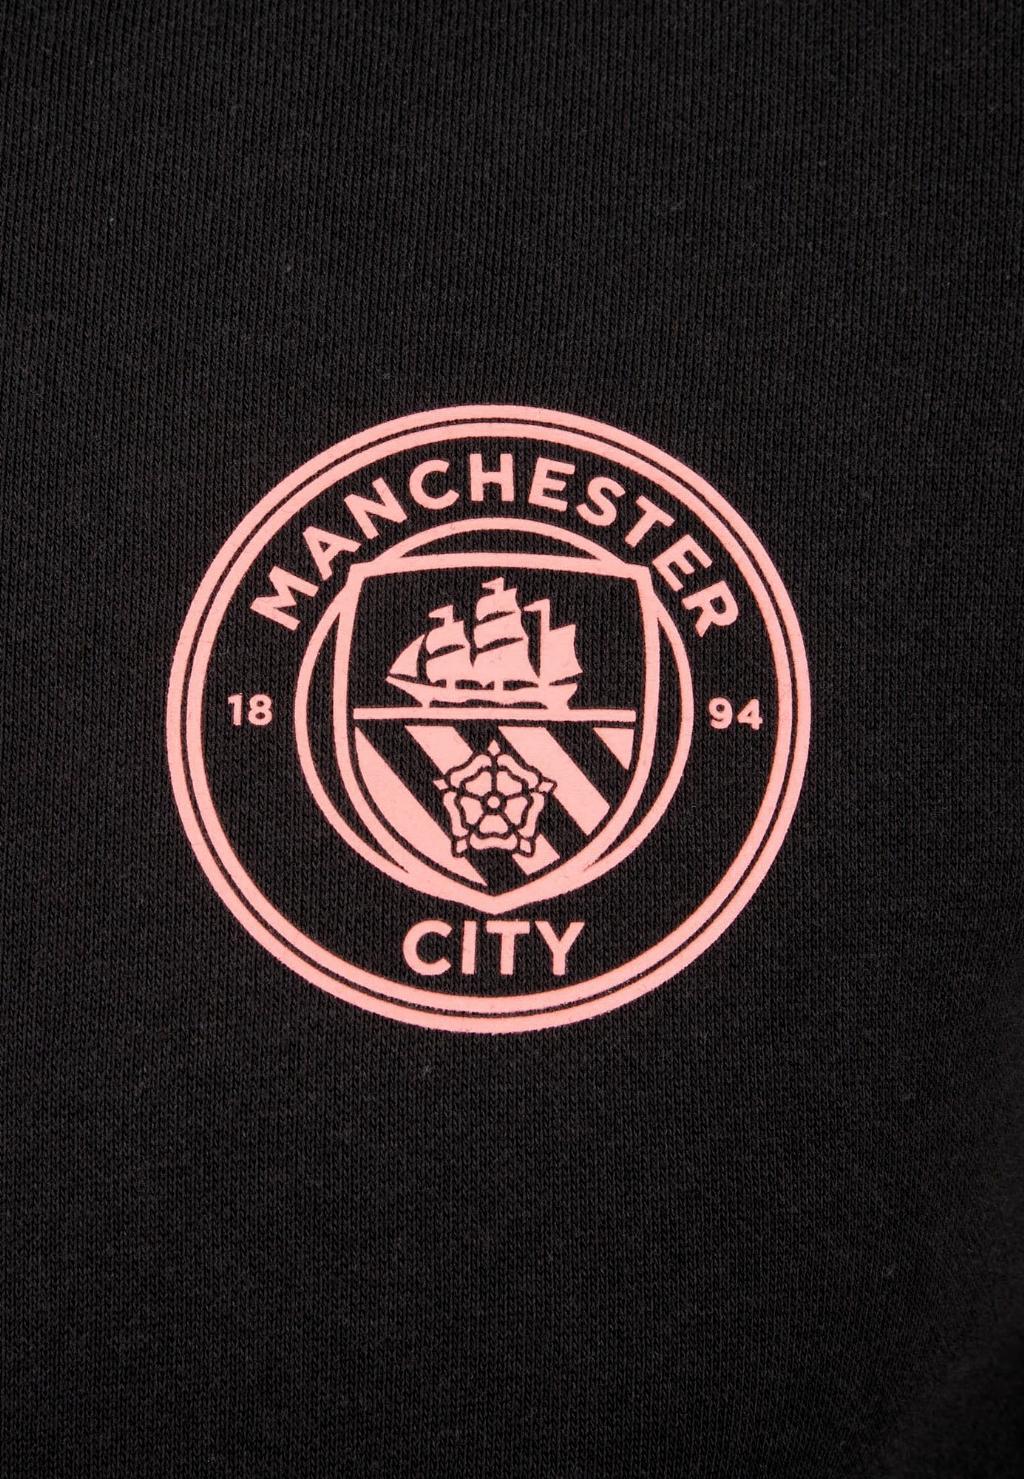 Puma Sweatshirt Manchester City Ftblculture Herren Schwarz Grosse Xl In 2020 Manchester City Manchester City Logo Manchester City Wallpaper